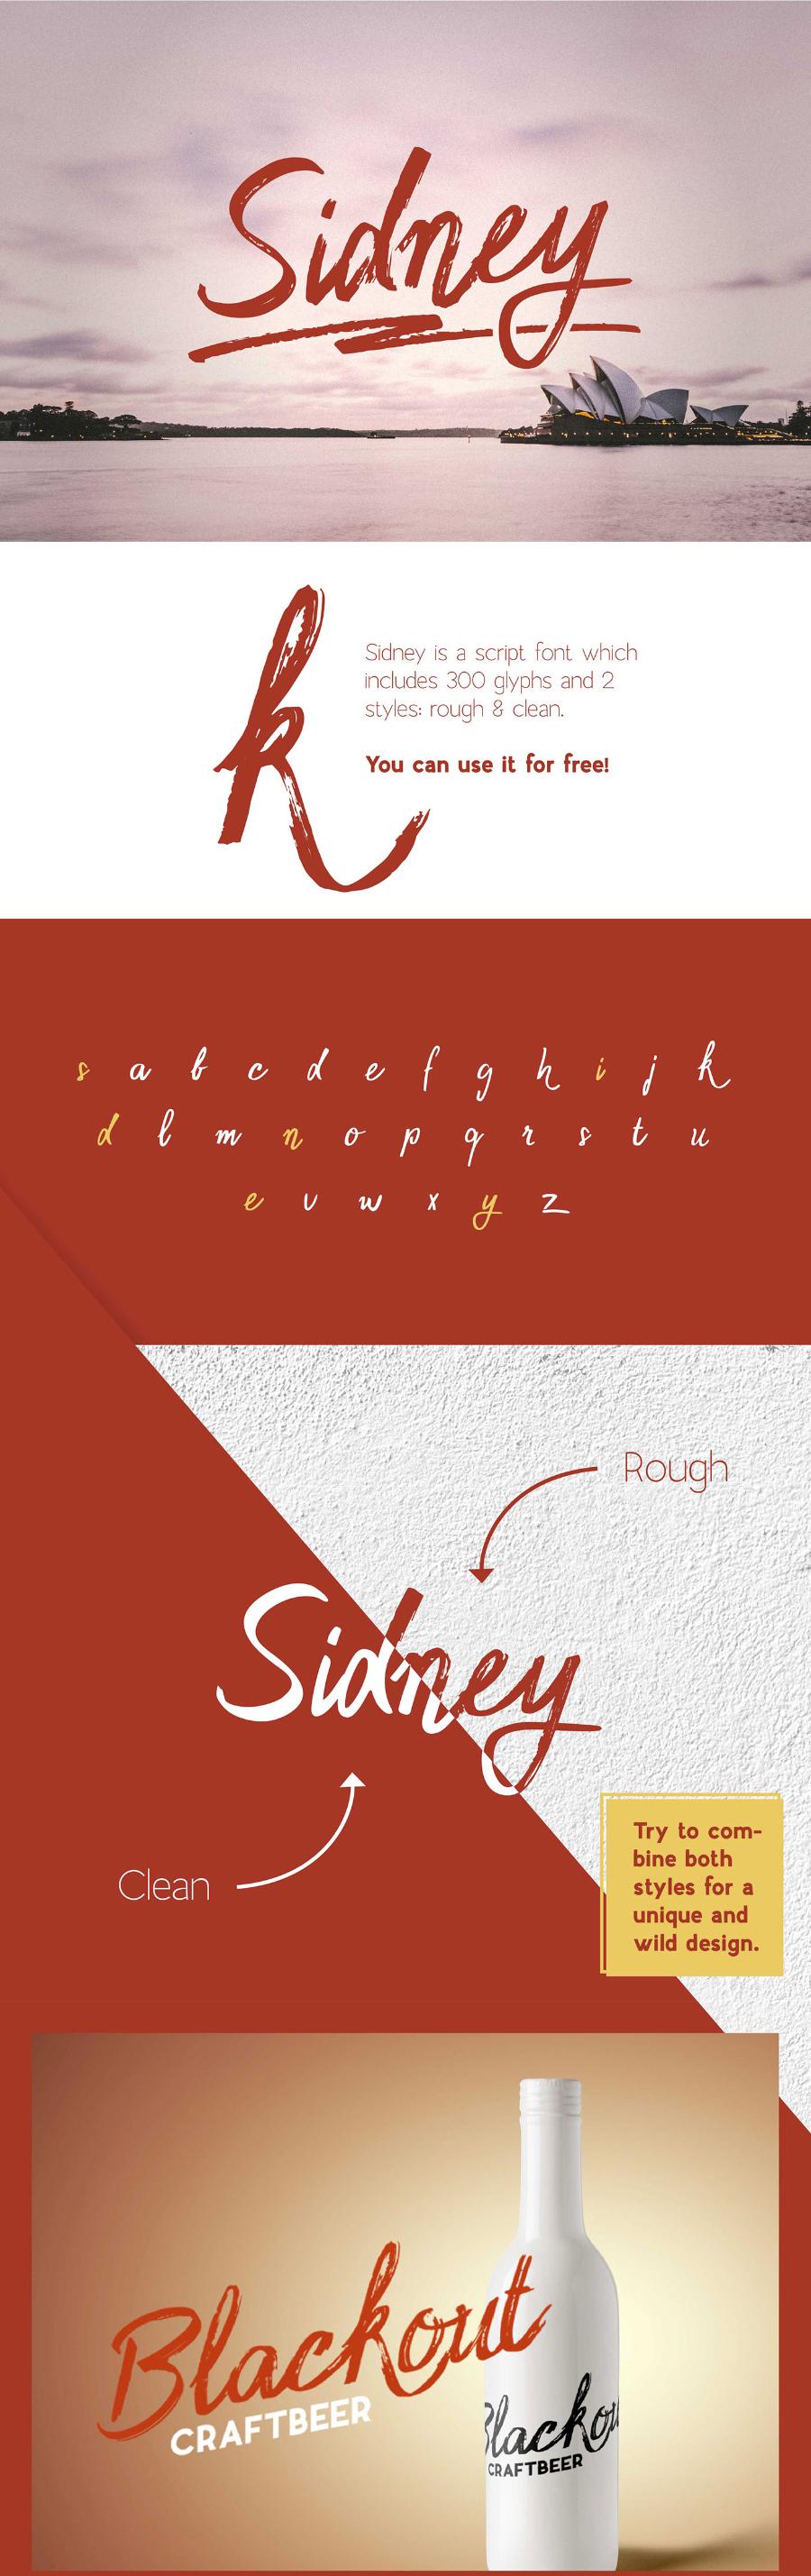 Sidney Free Font